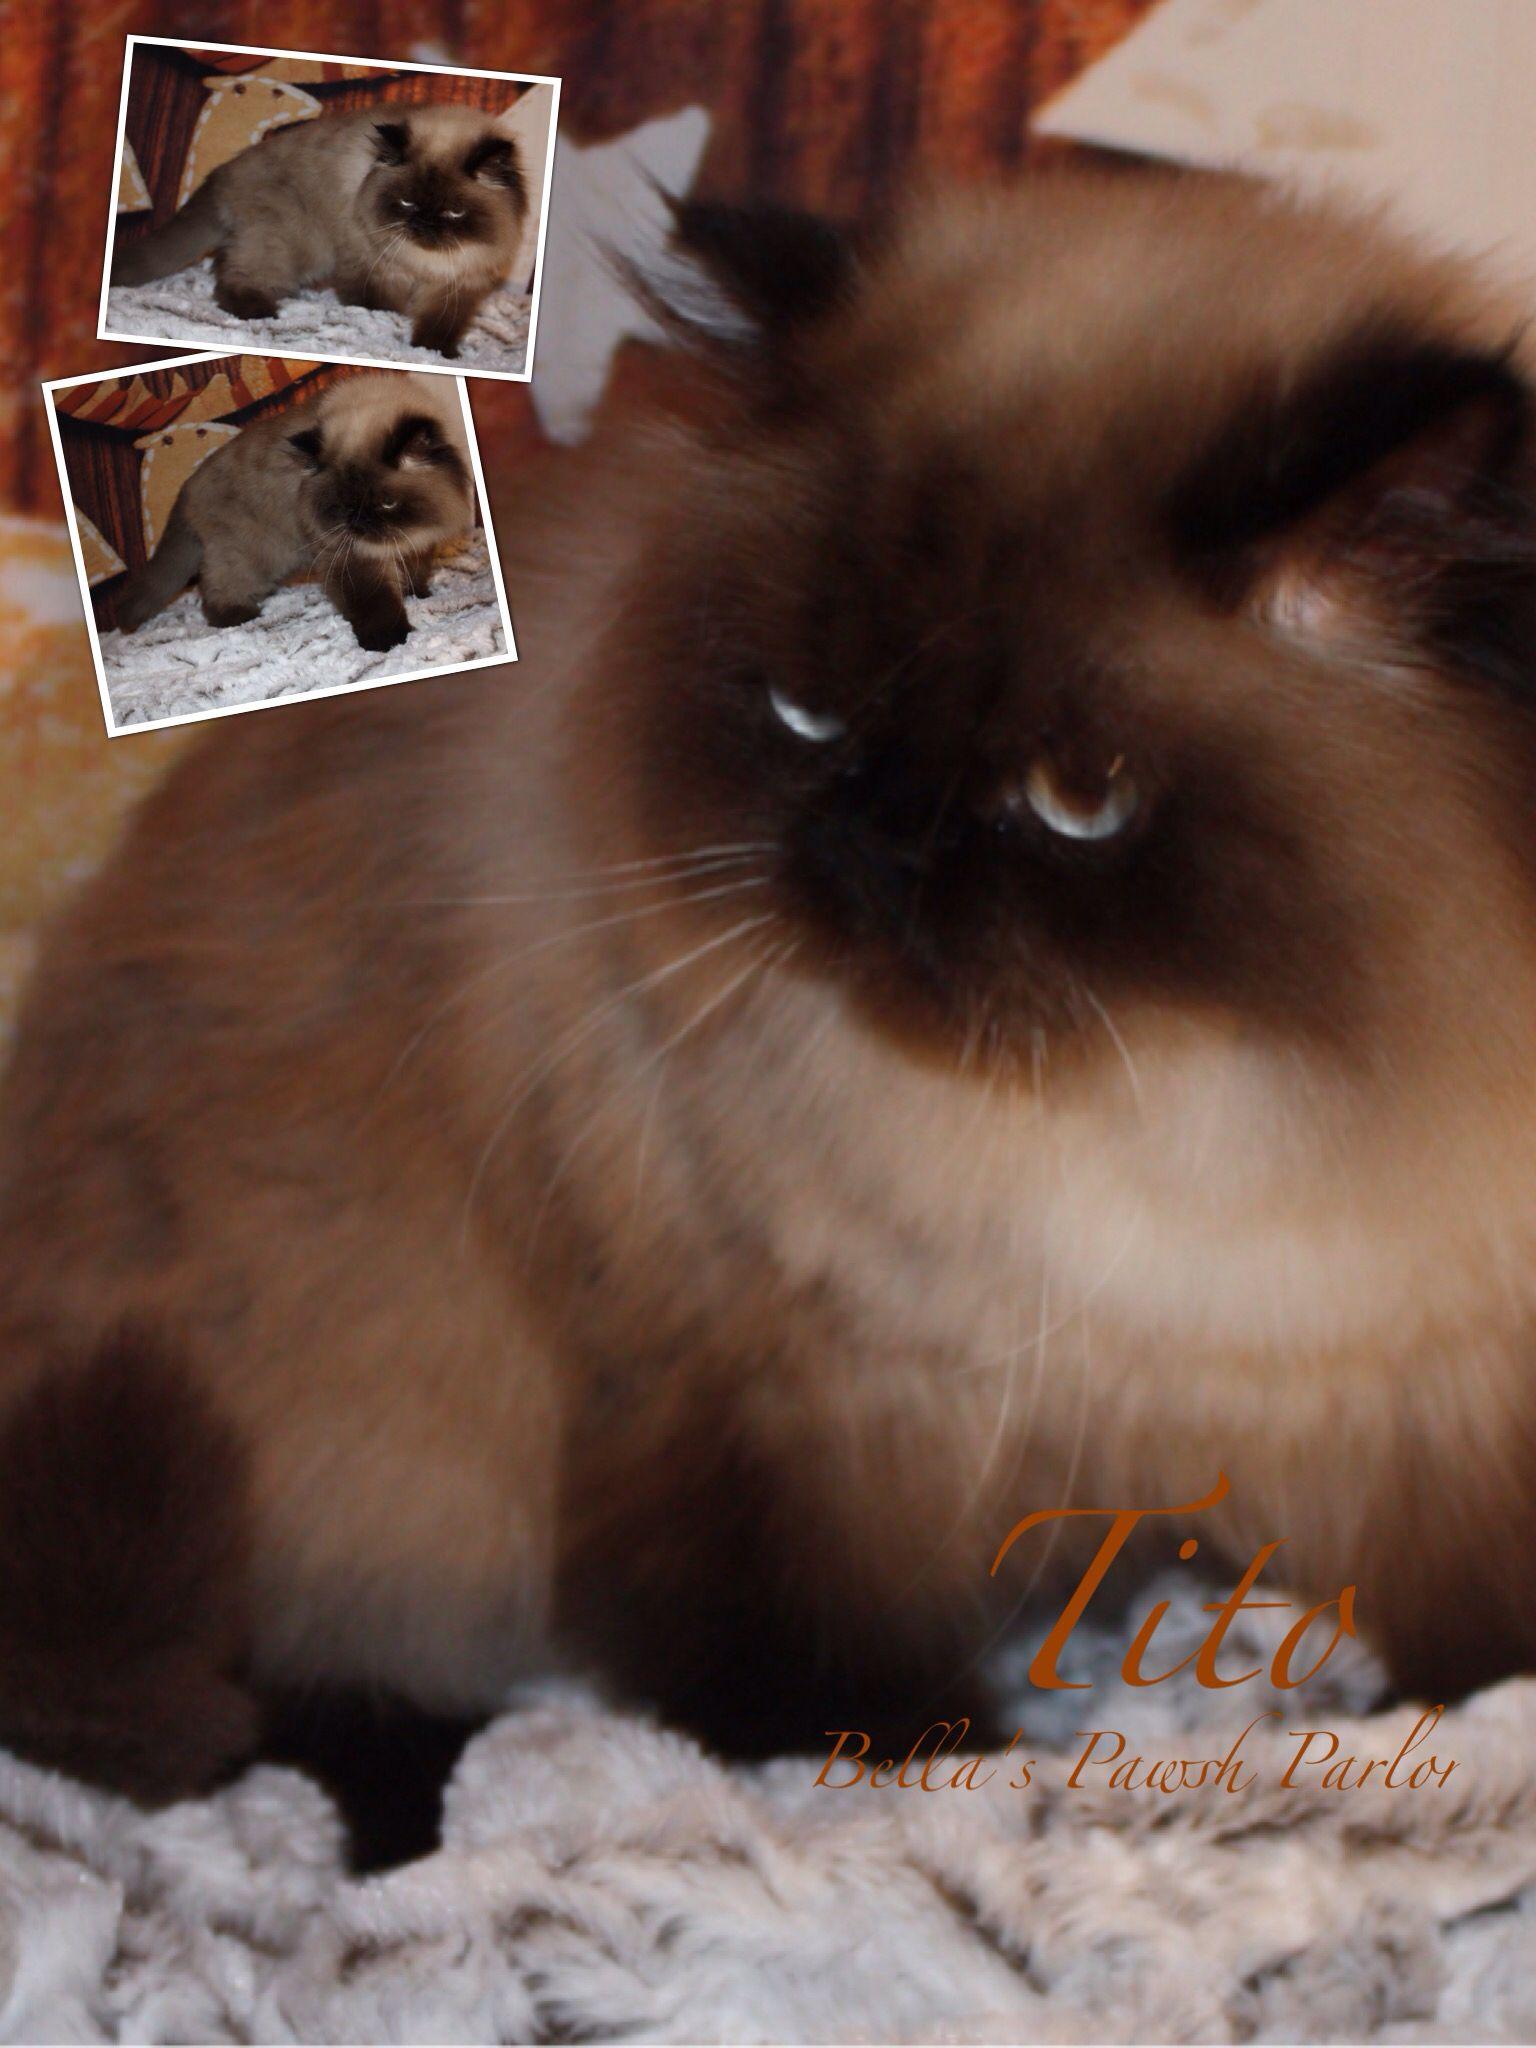 Bella S Pawsh Parlor Cute Cats Himalayan Cat Persian Cat